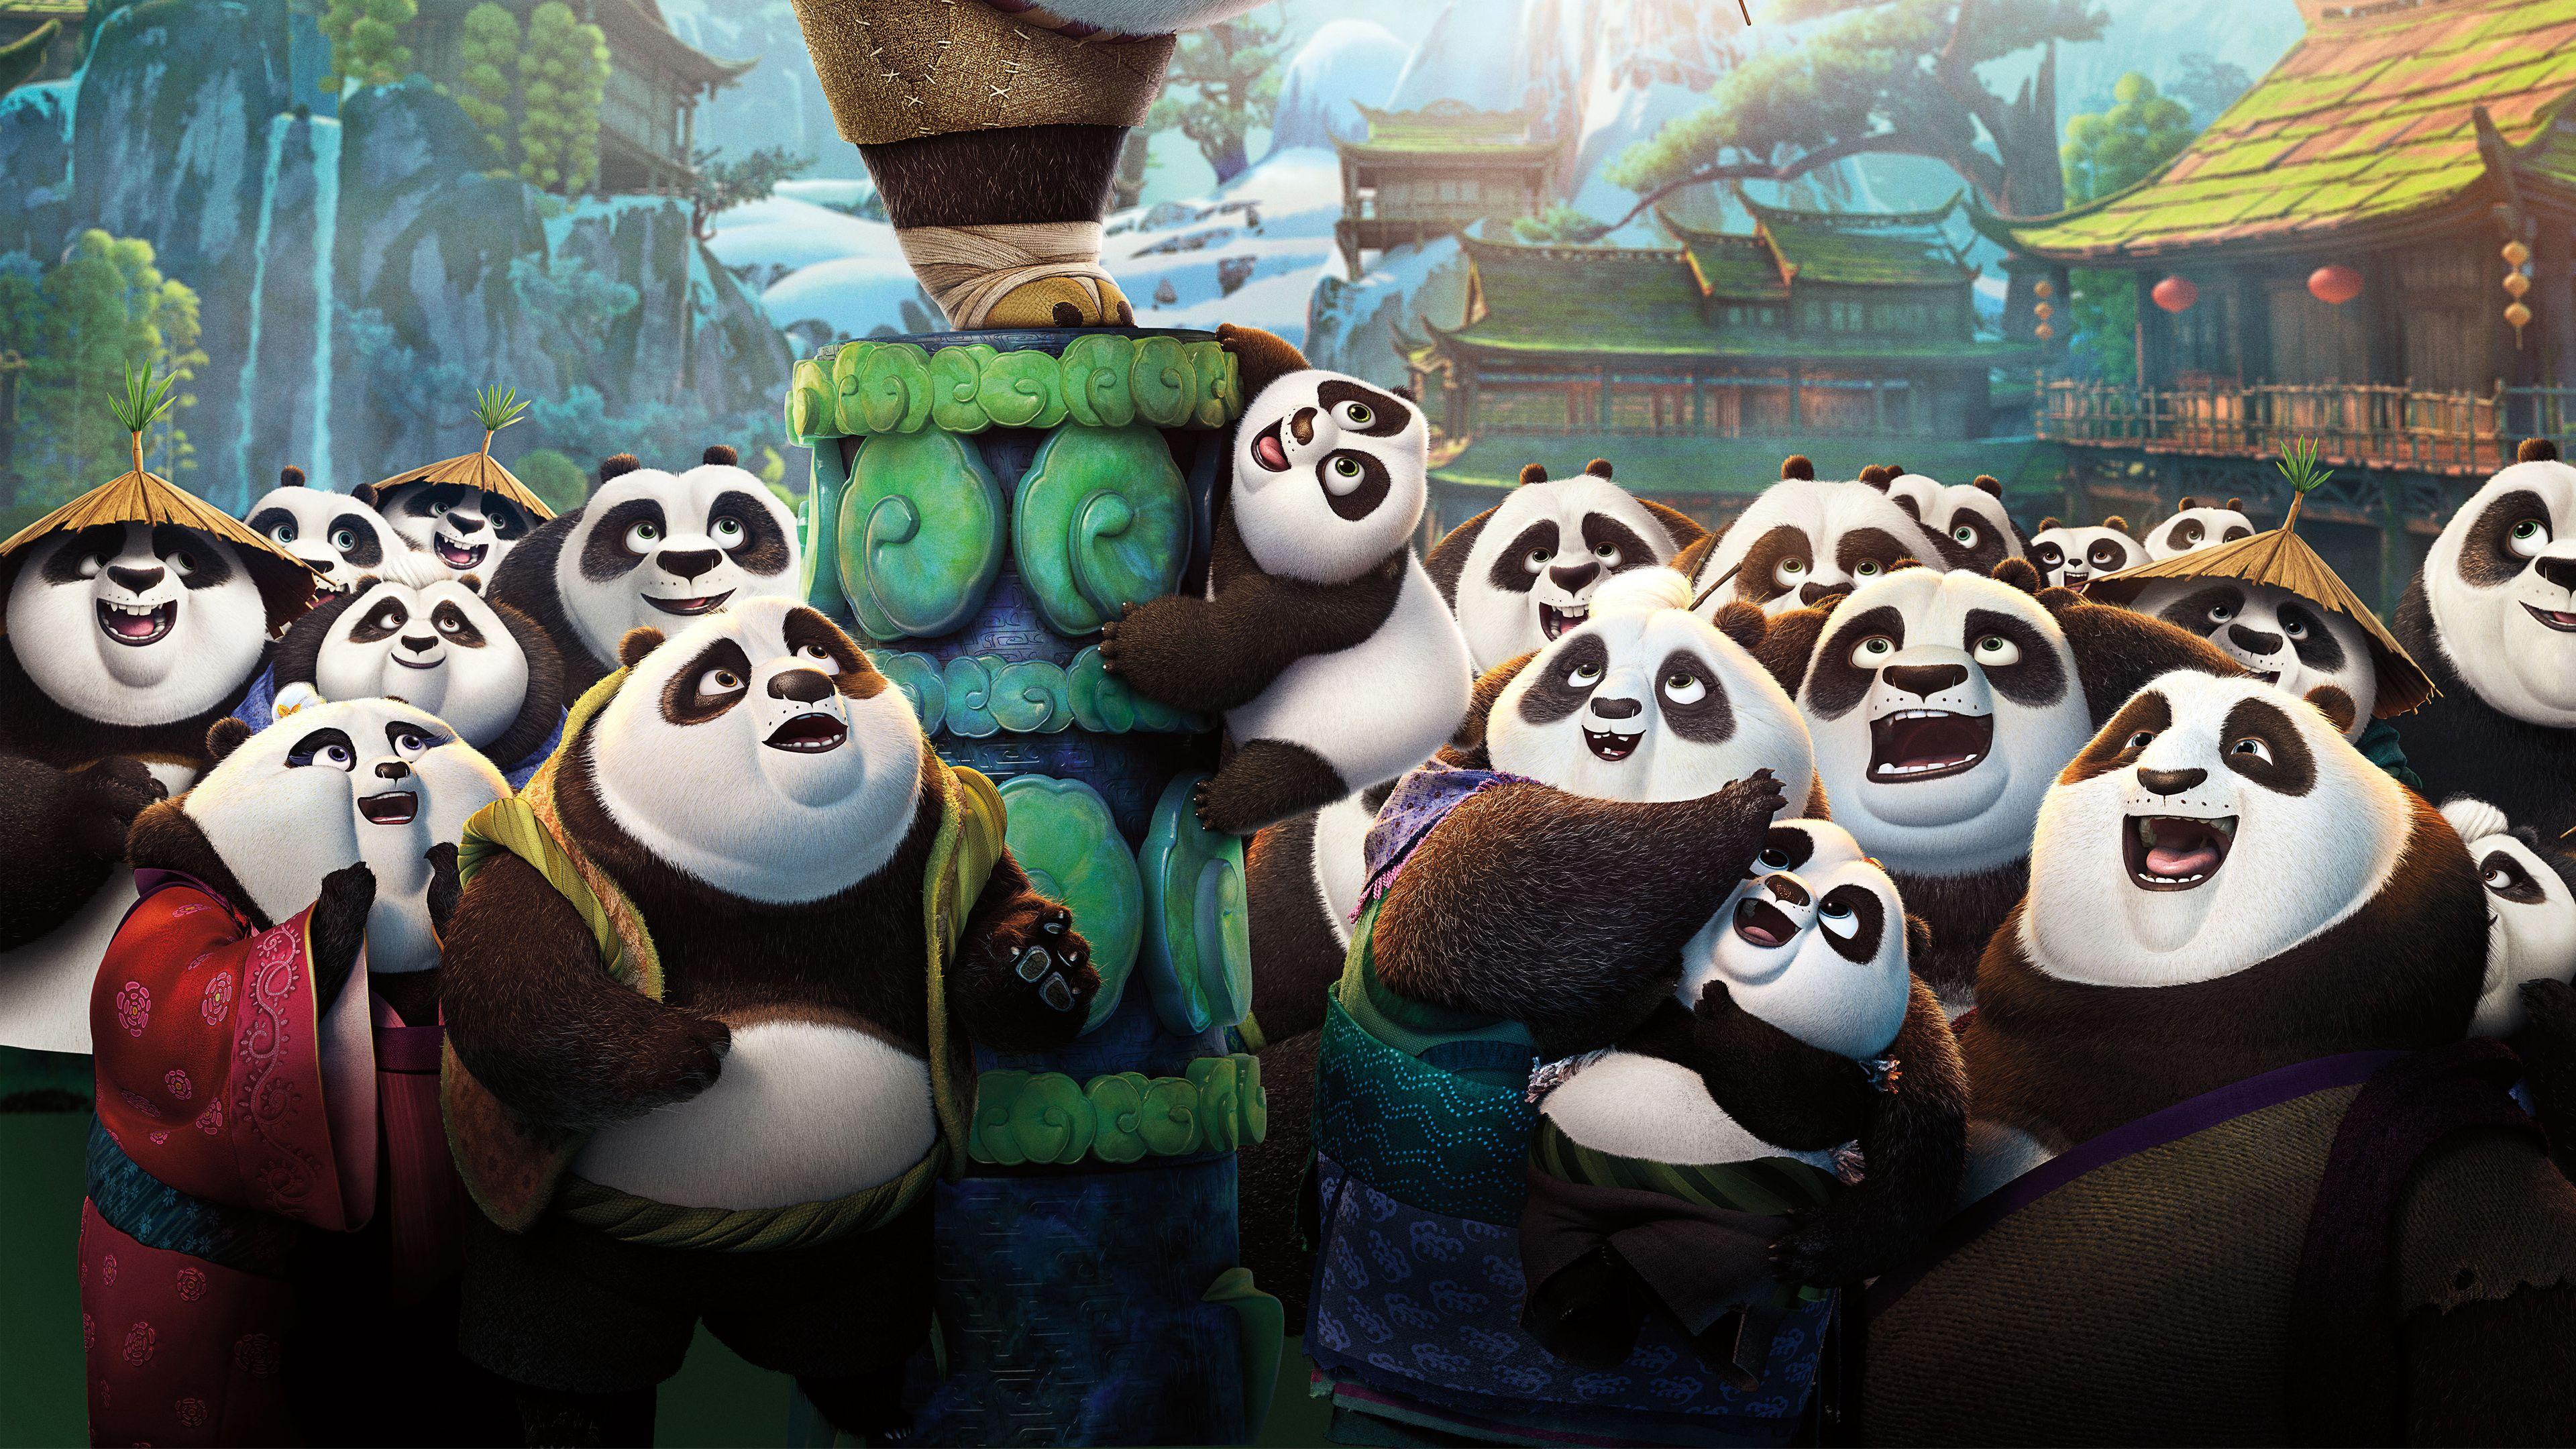 Download 2016 kung fu panda 3 wallpaper best wallpapers